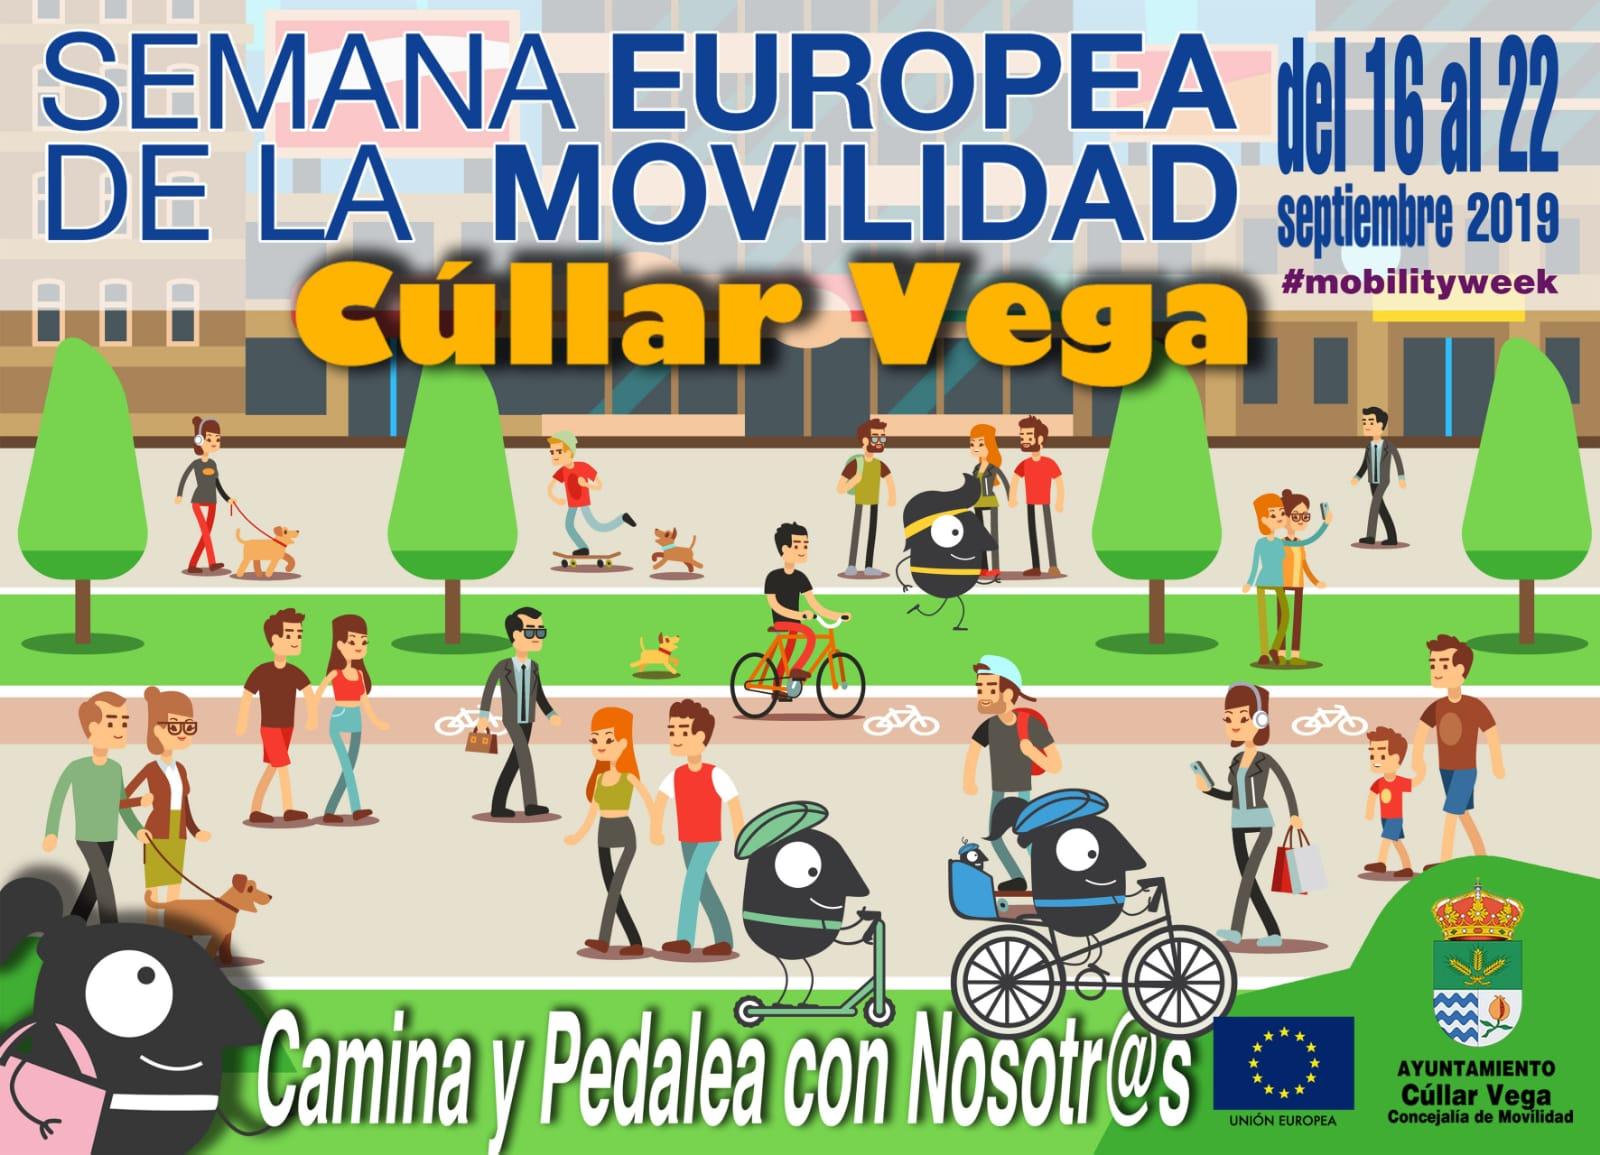 Semana Europea de la Movilidad 2019 en Cúllar Vega